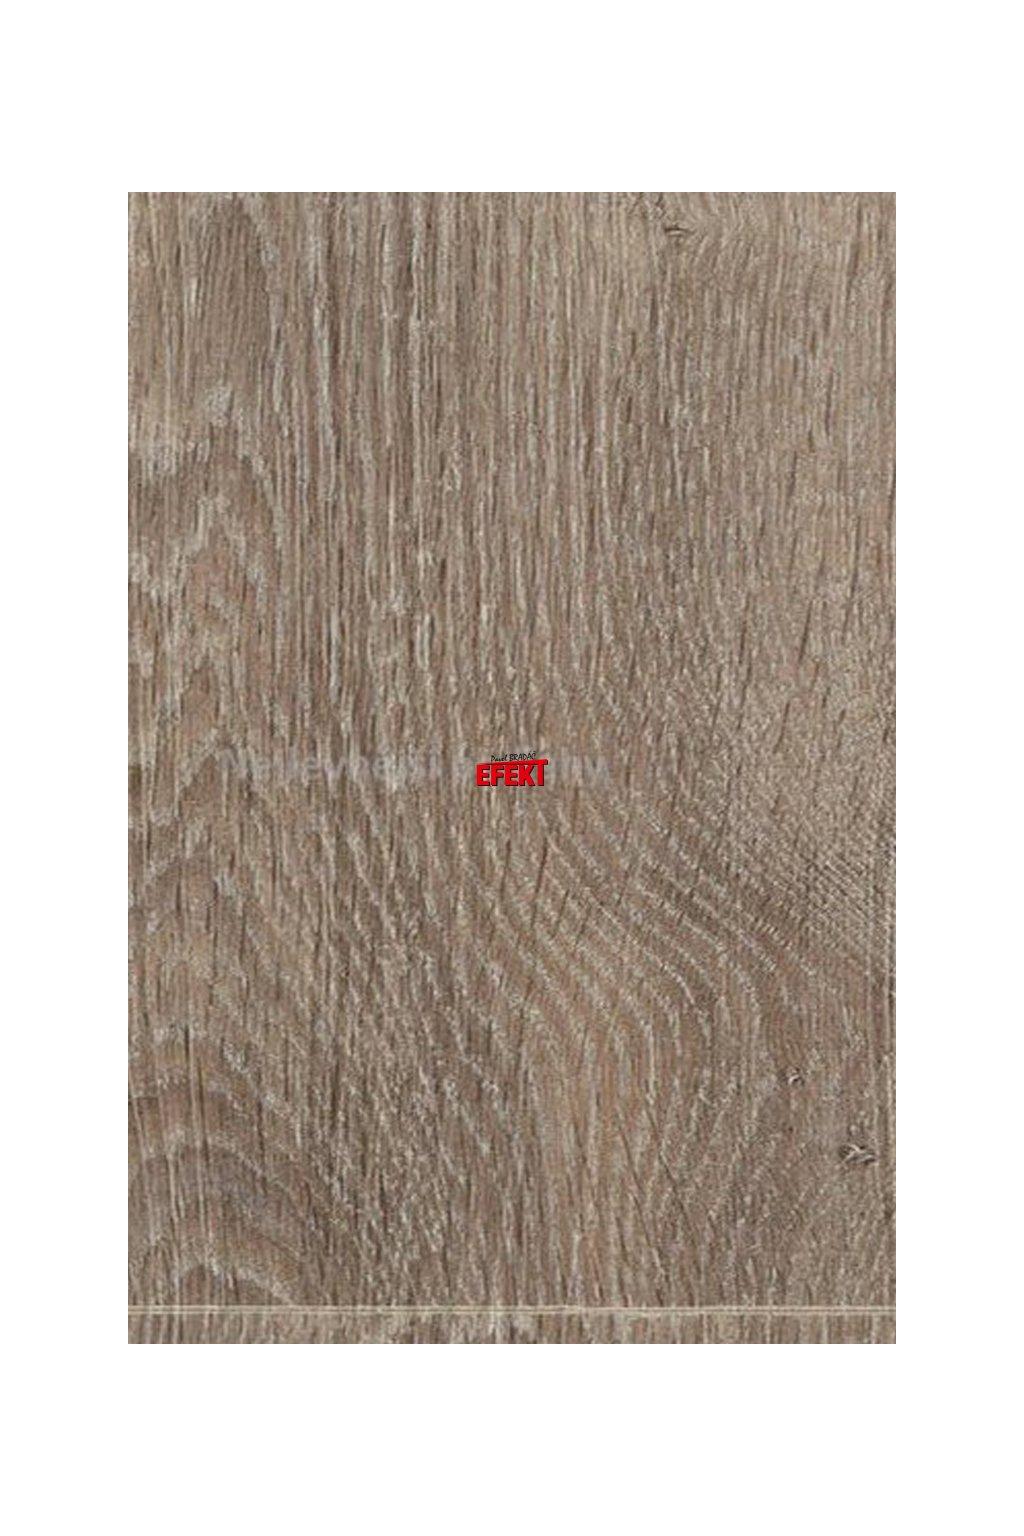 Gerflor Timberline Whitewashed Oak Warm Grey 0542